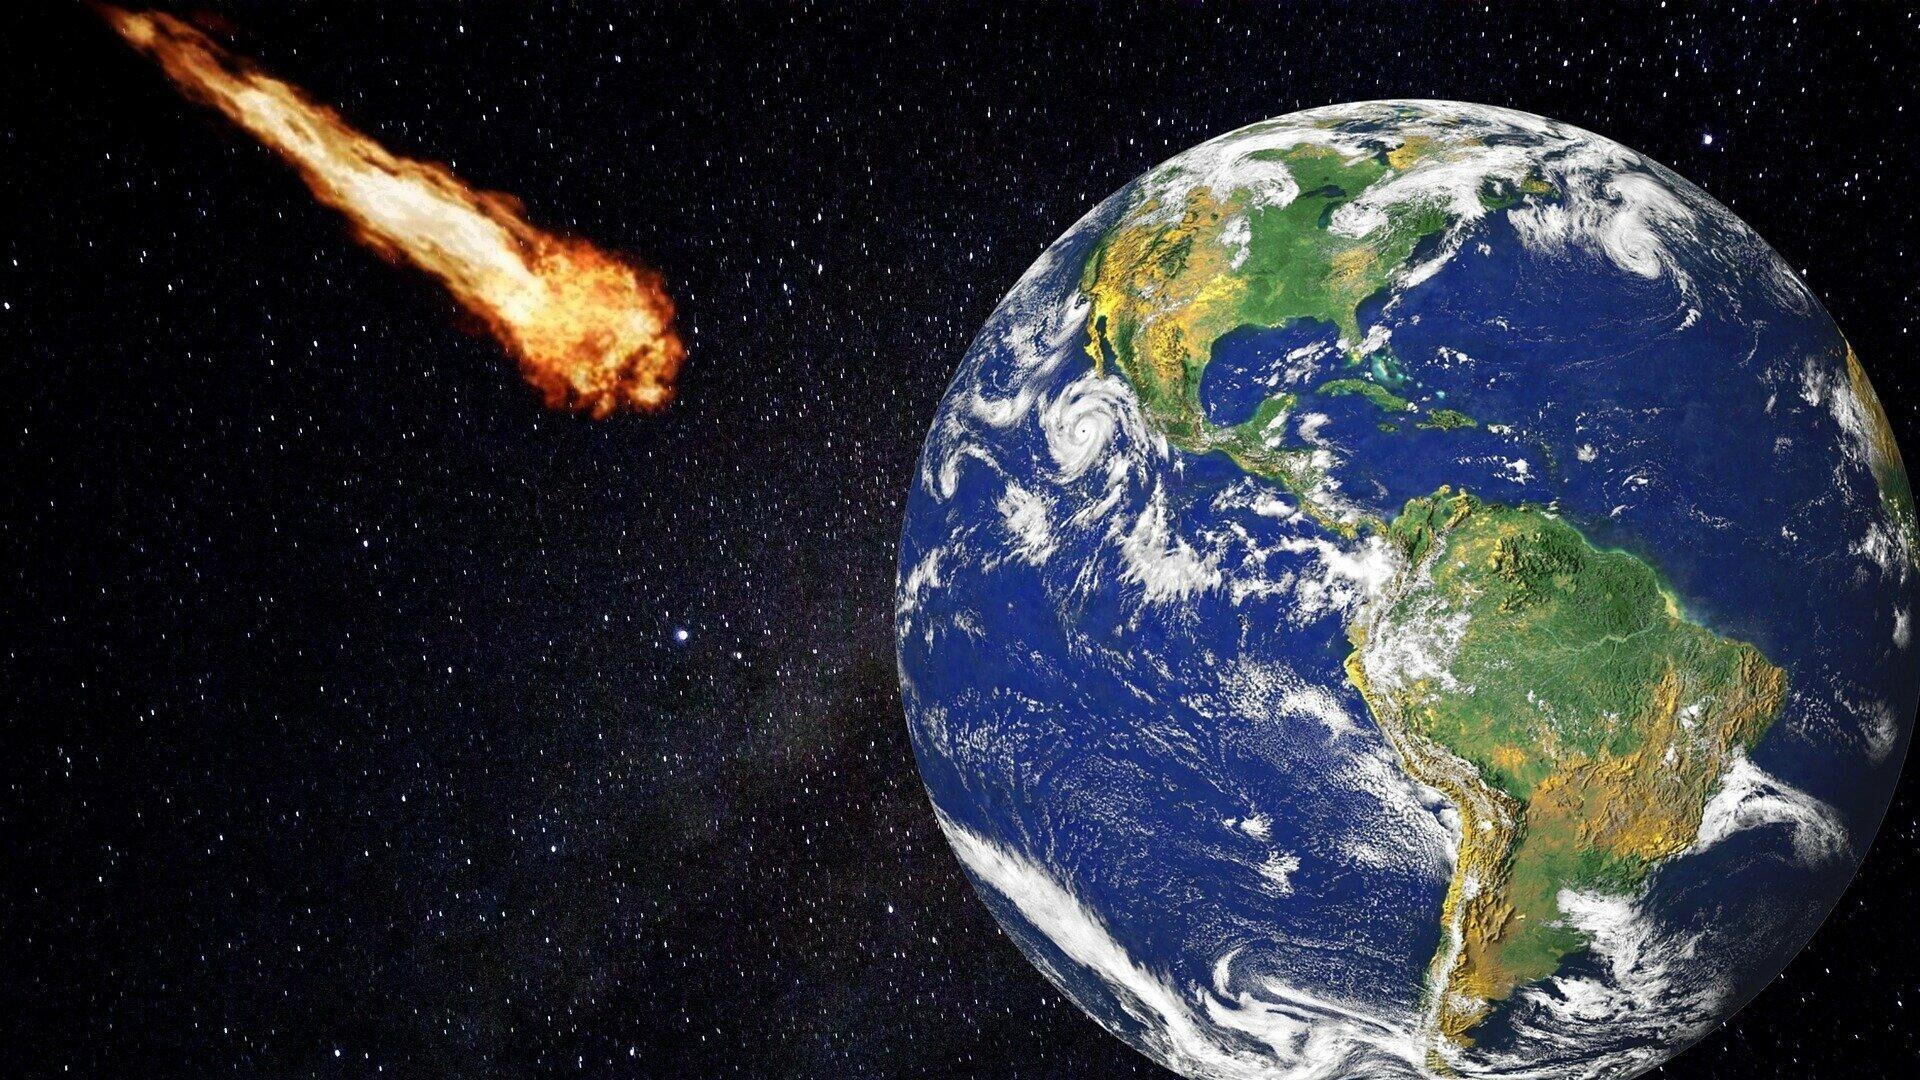 Meteor (Symbolbild) - SNA, 1920, 29.09.2021